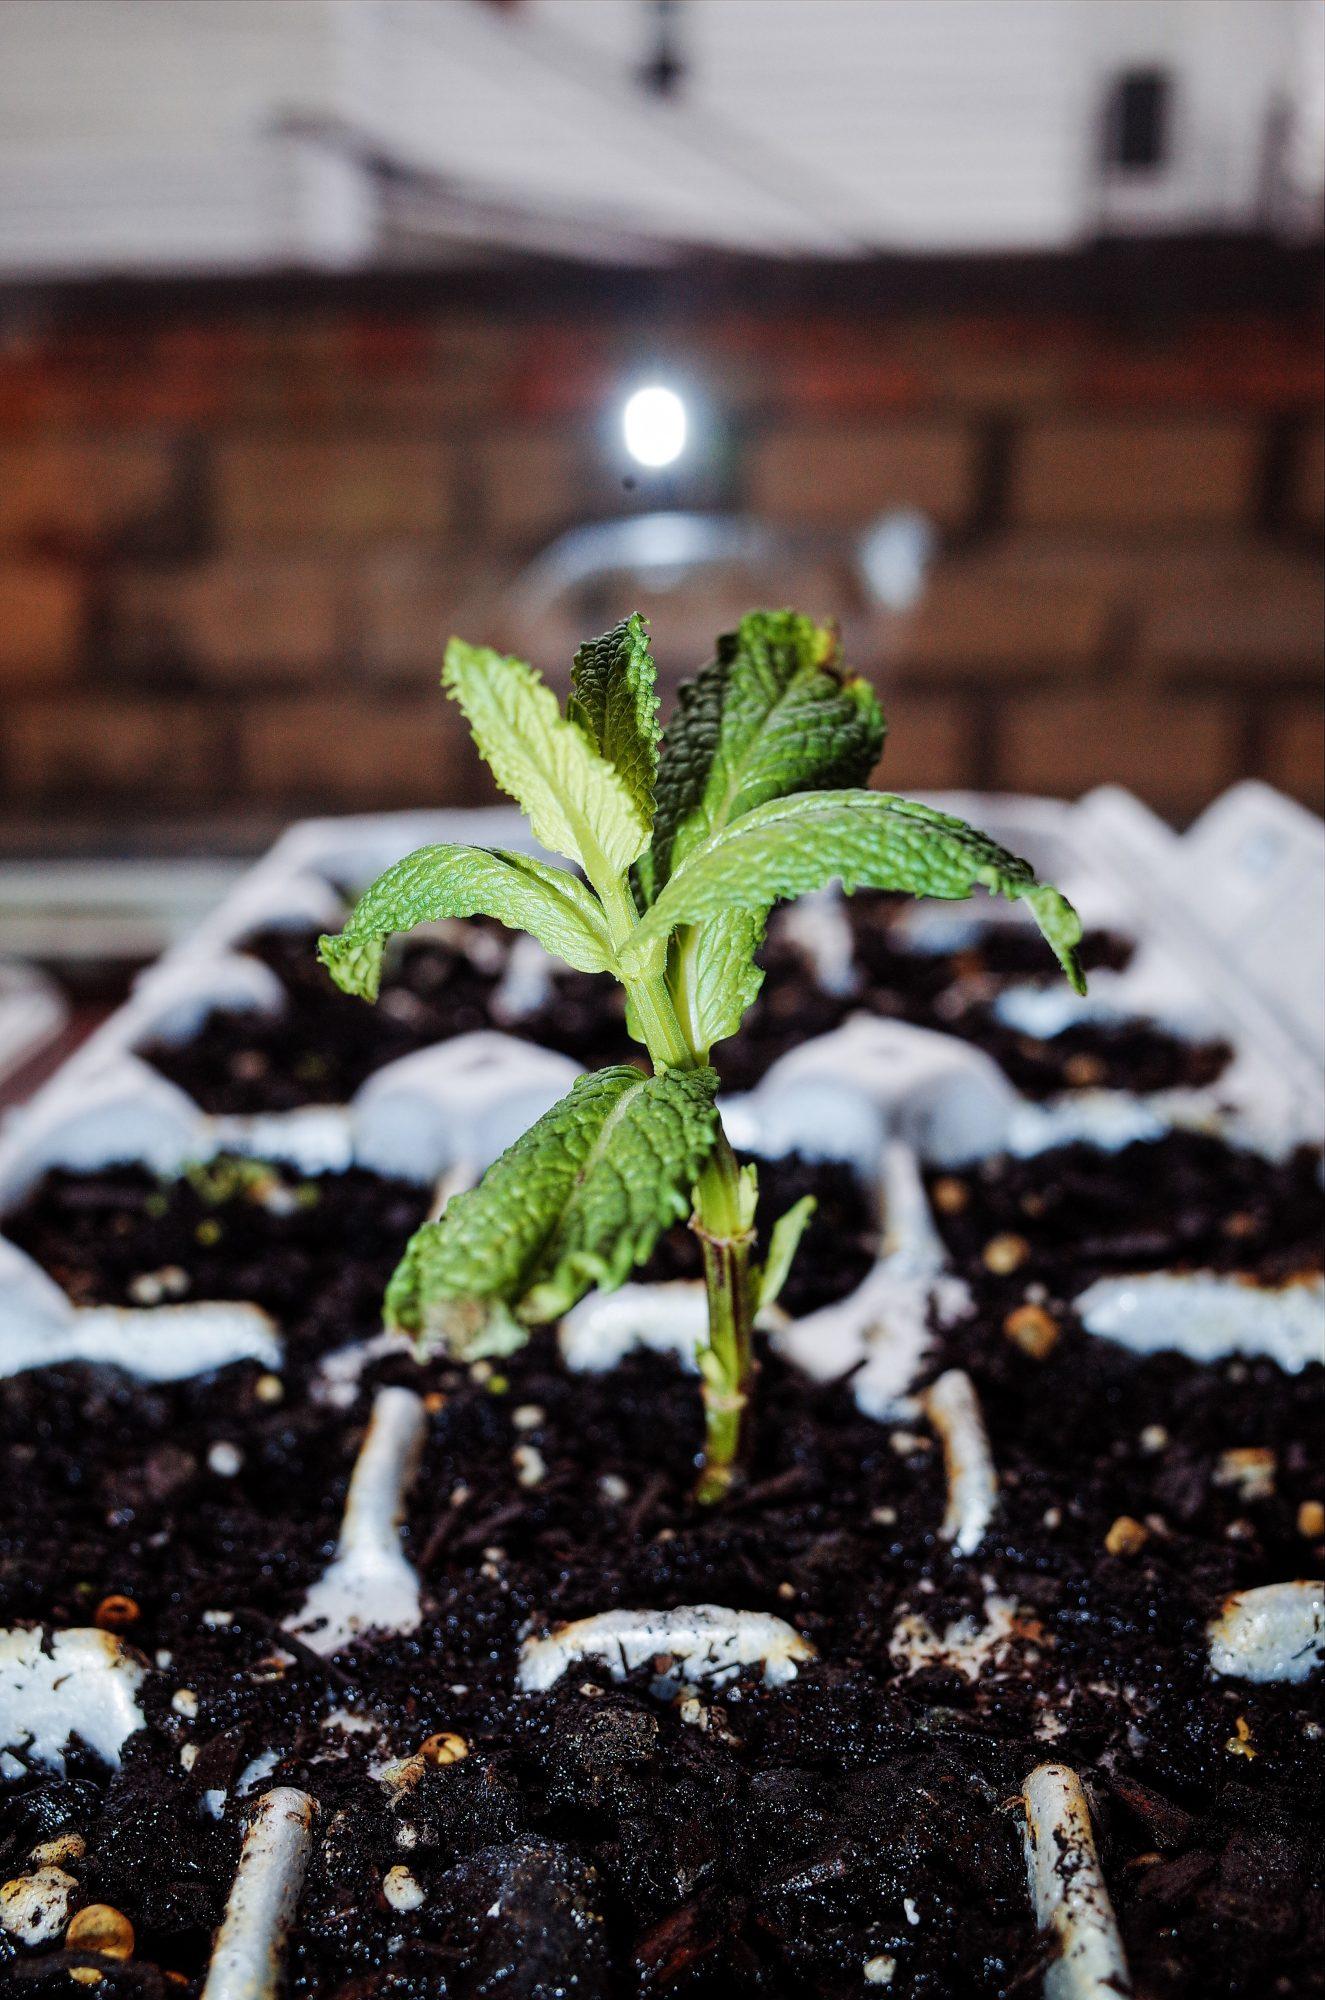 Growing green mint plant. Boston, 2018